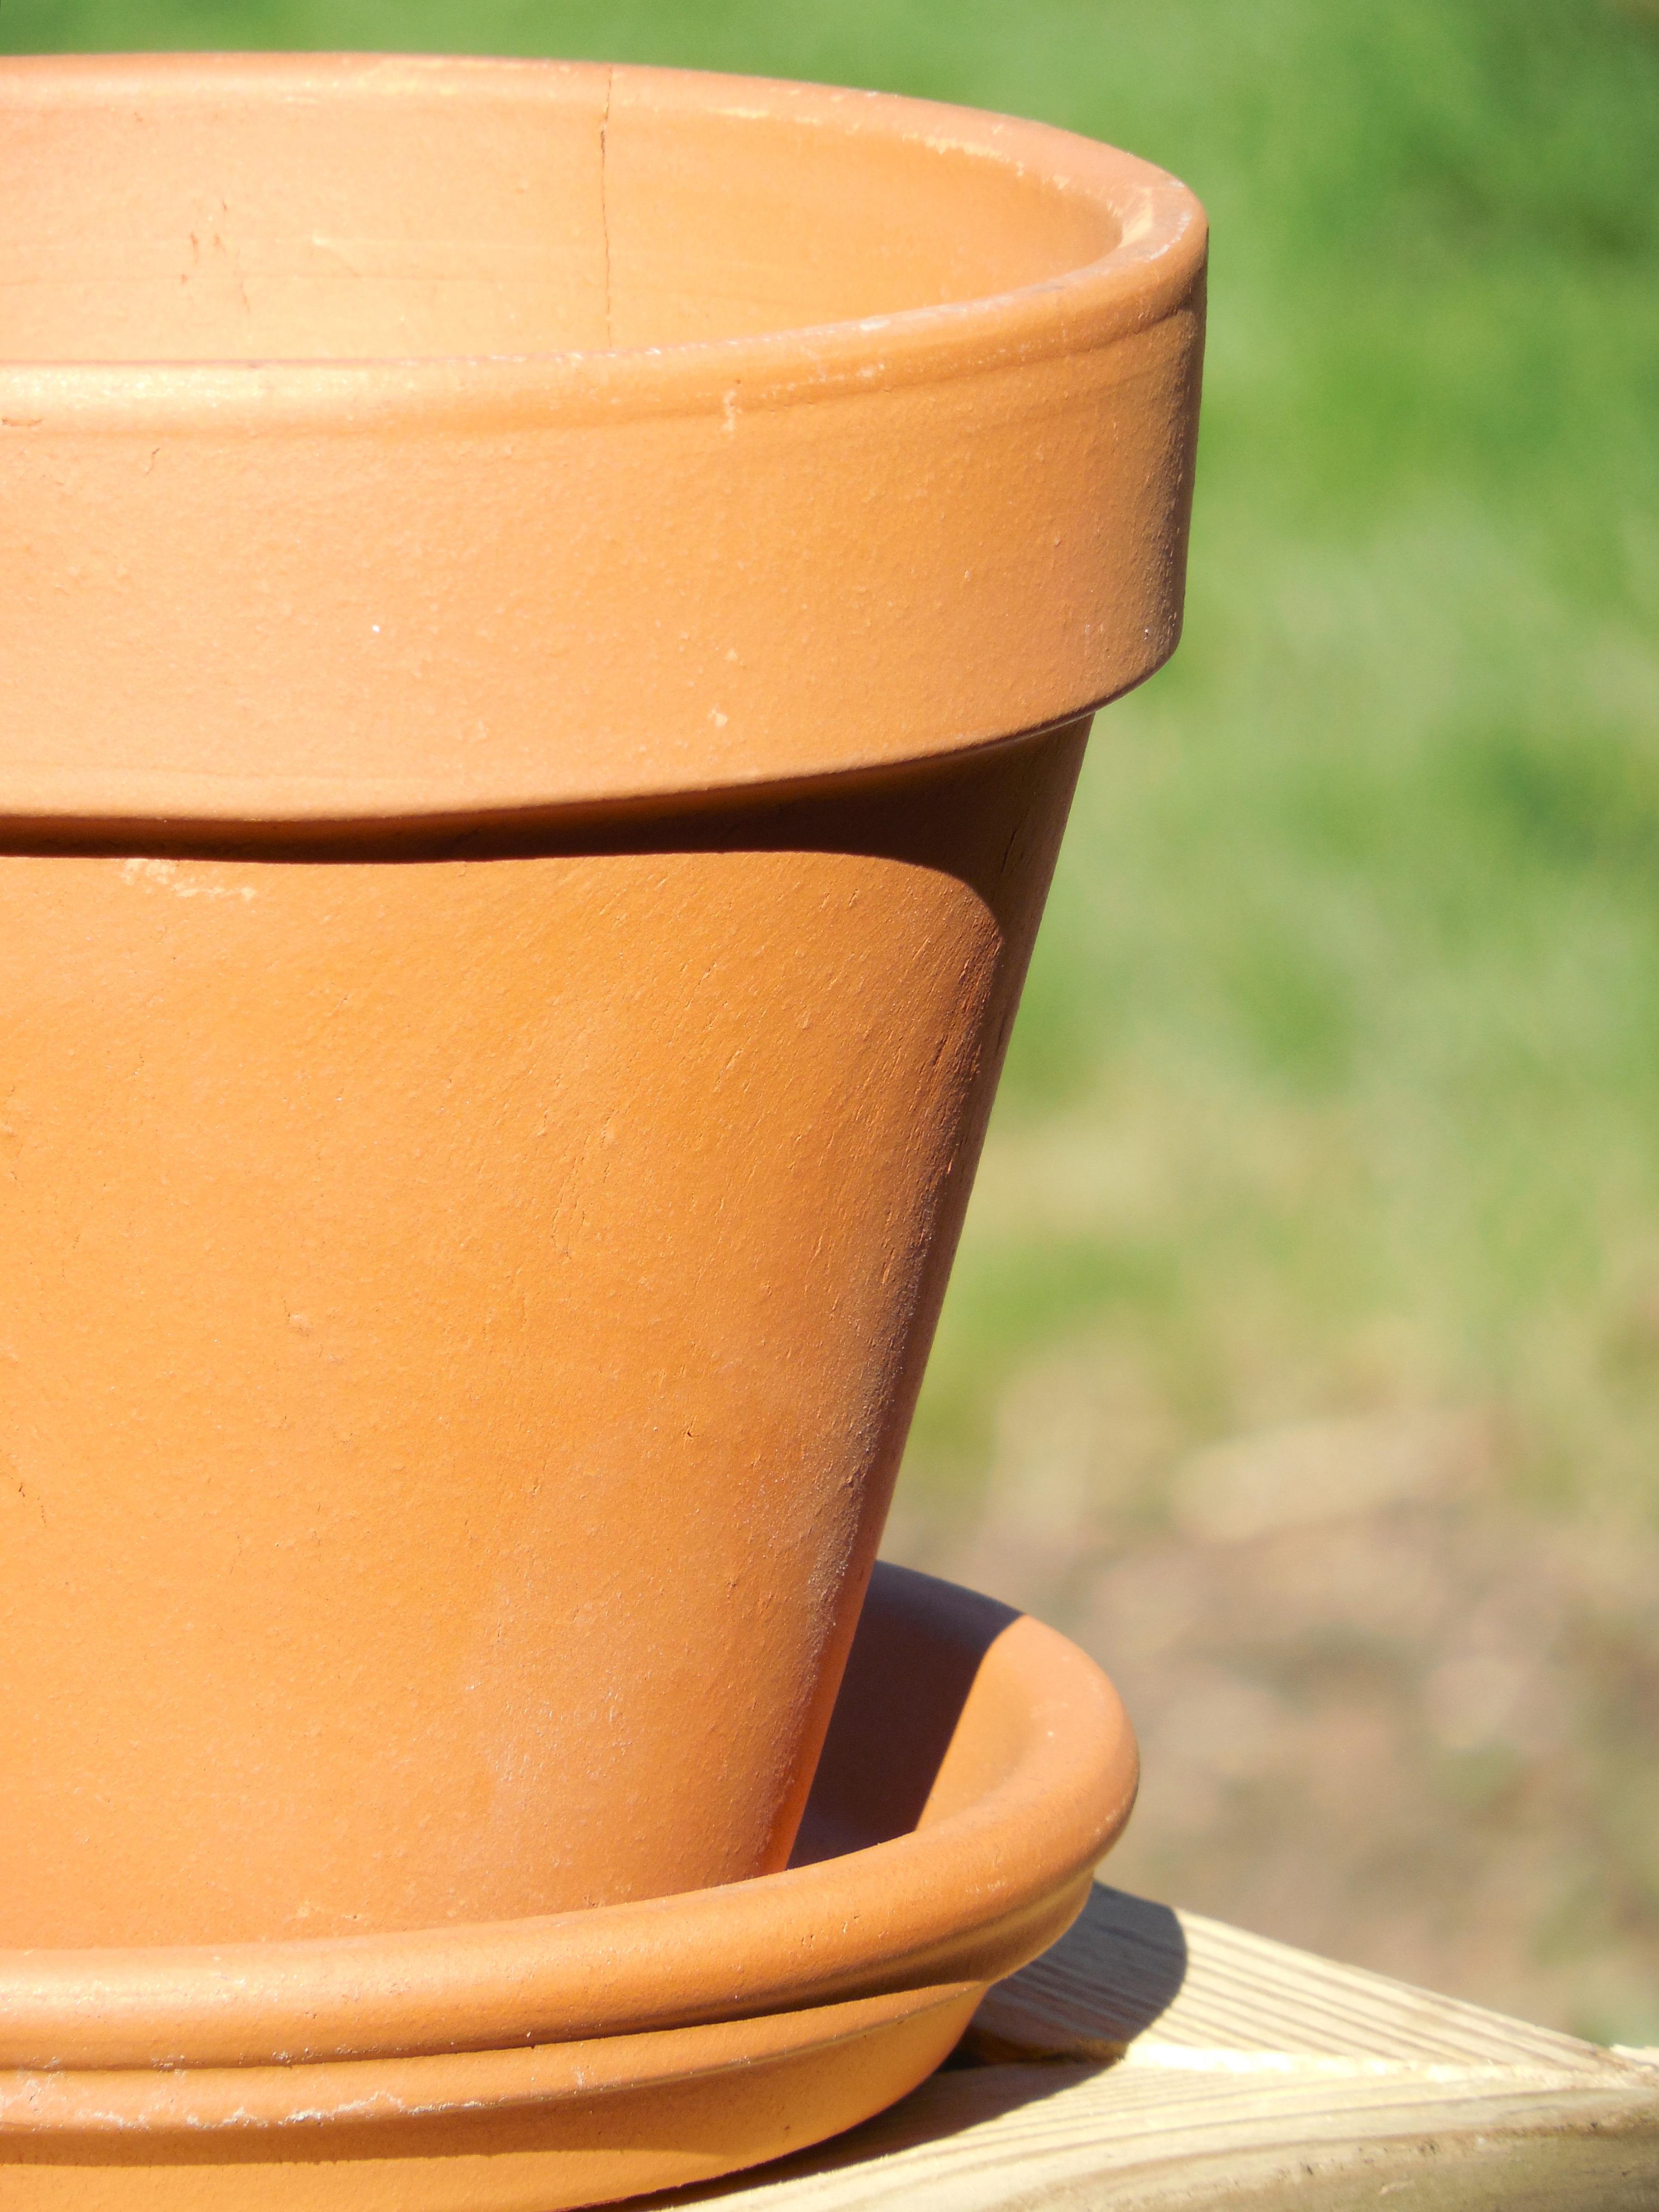 Free Images Table Plant Wood Flower Pot Orange